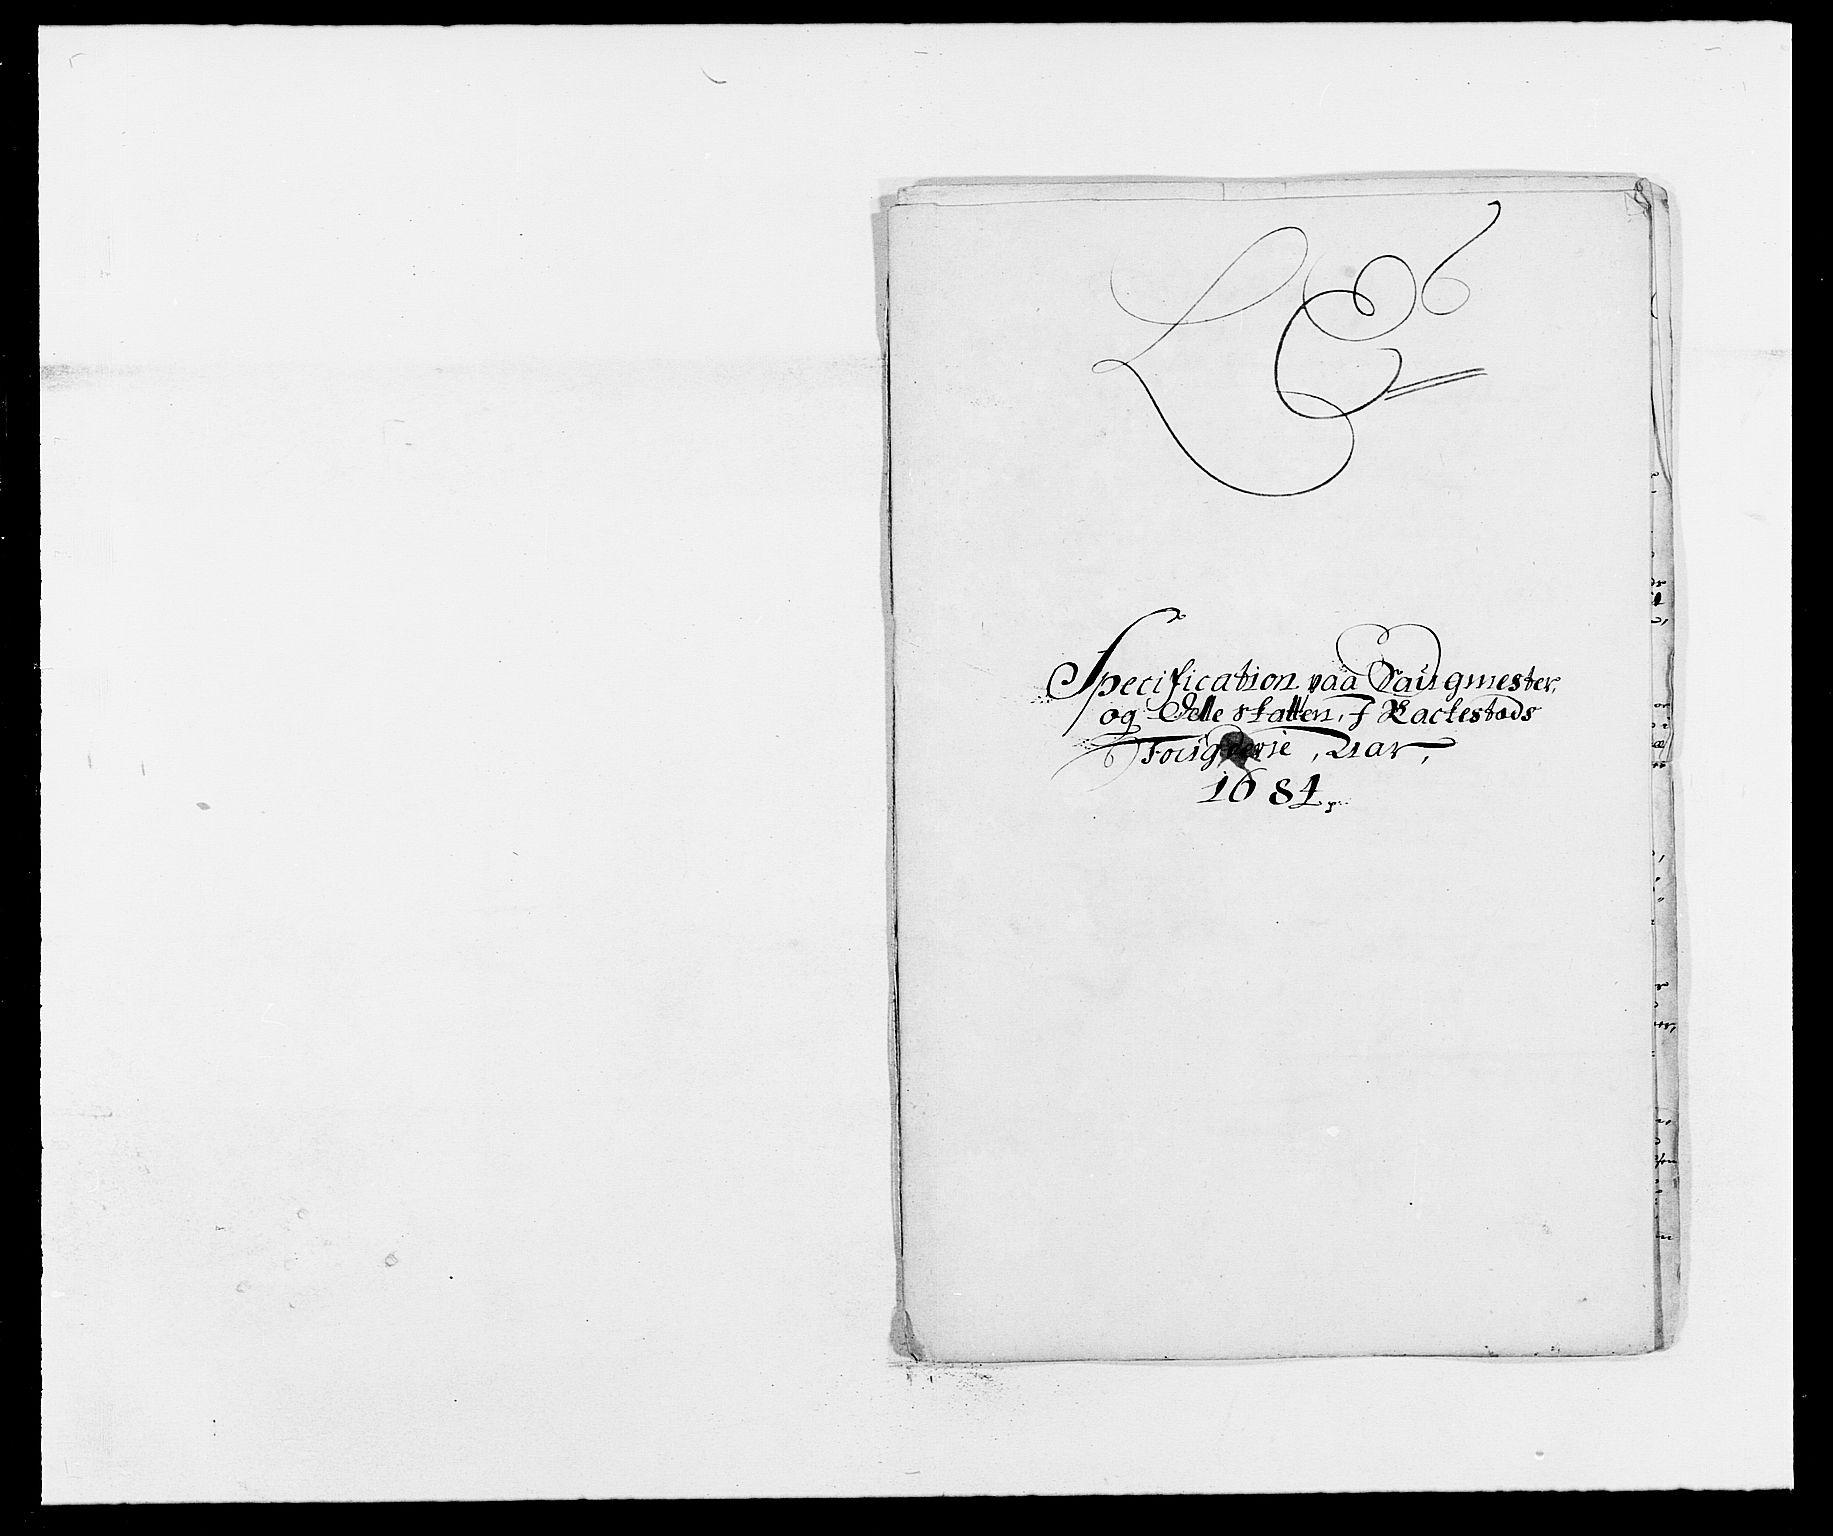 RA, Rentekammeret inntil 1814, Reviderte regnskaper, Fogderegnskap, R05/L0274: Fogderegnskap Rakkestad, 1683-1684, s. 340